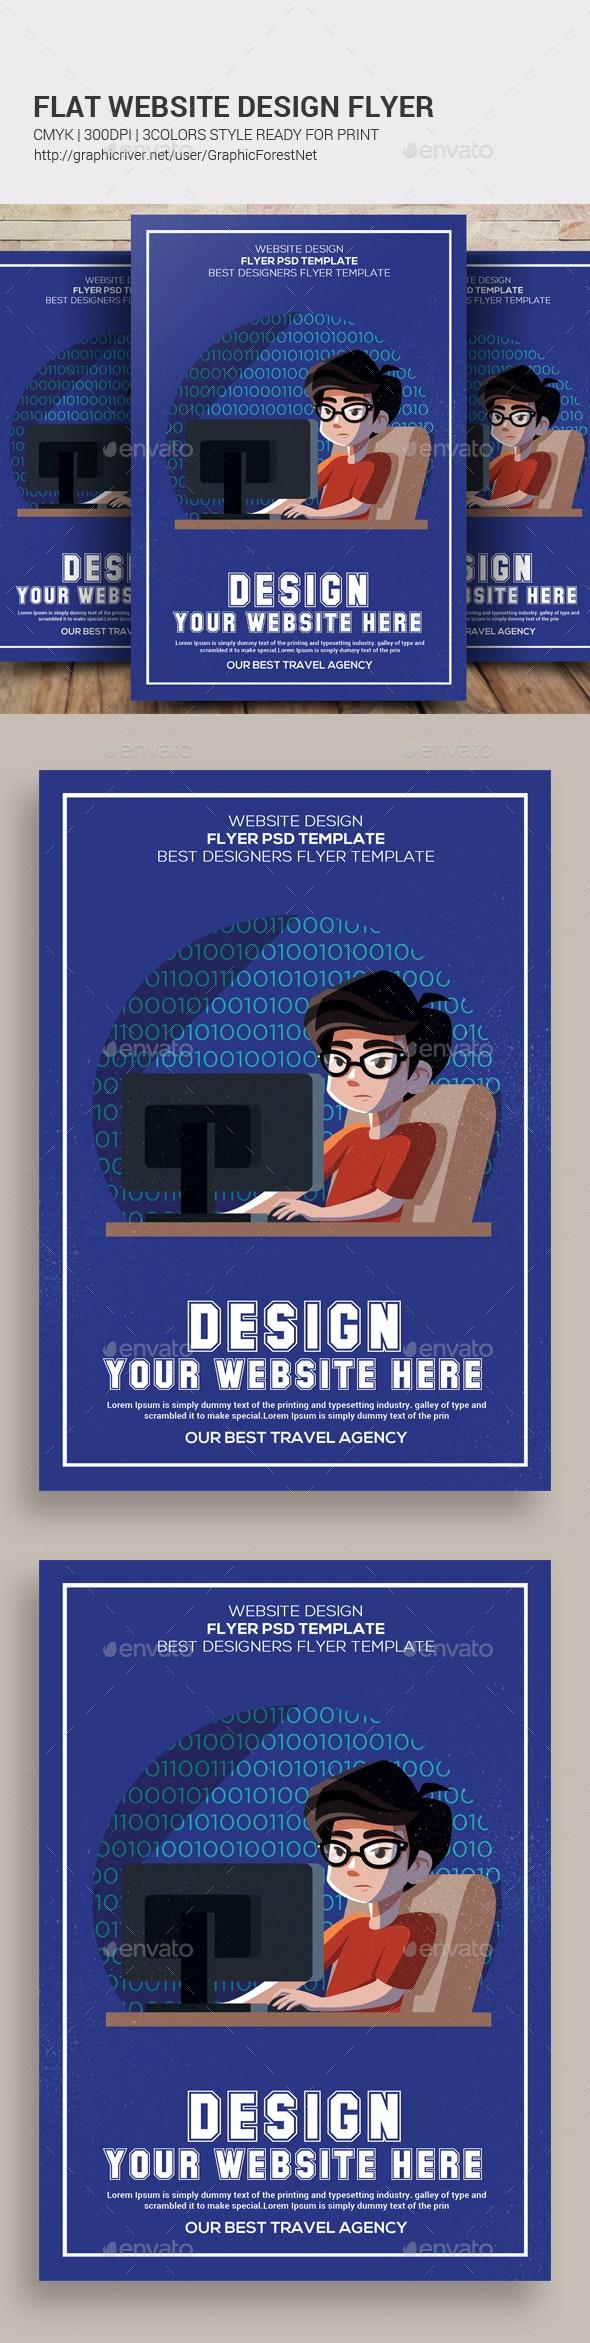 Flat Website Design Flyer - Flyers Print Templates